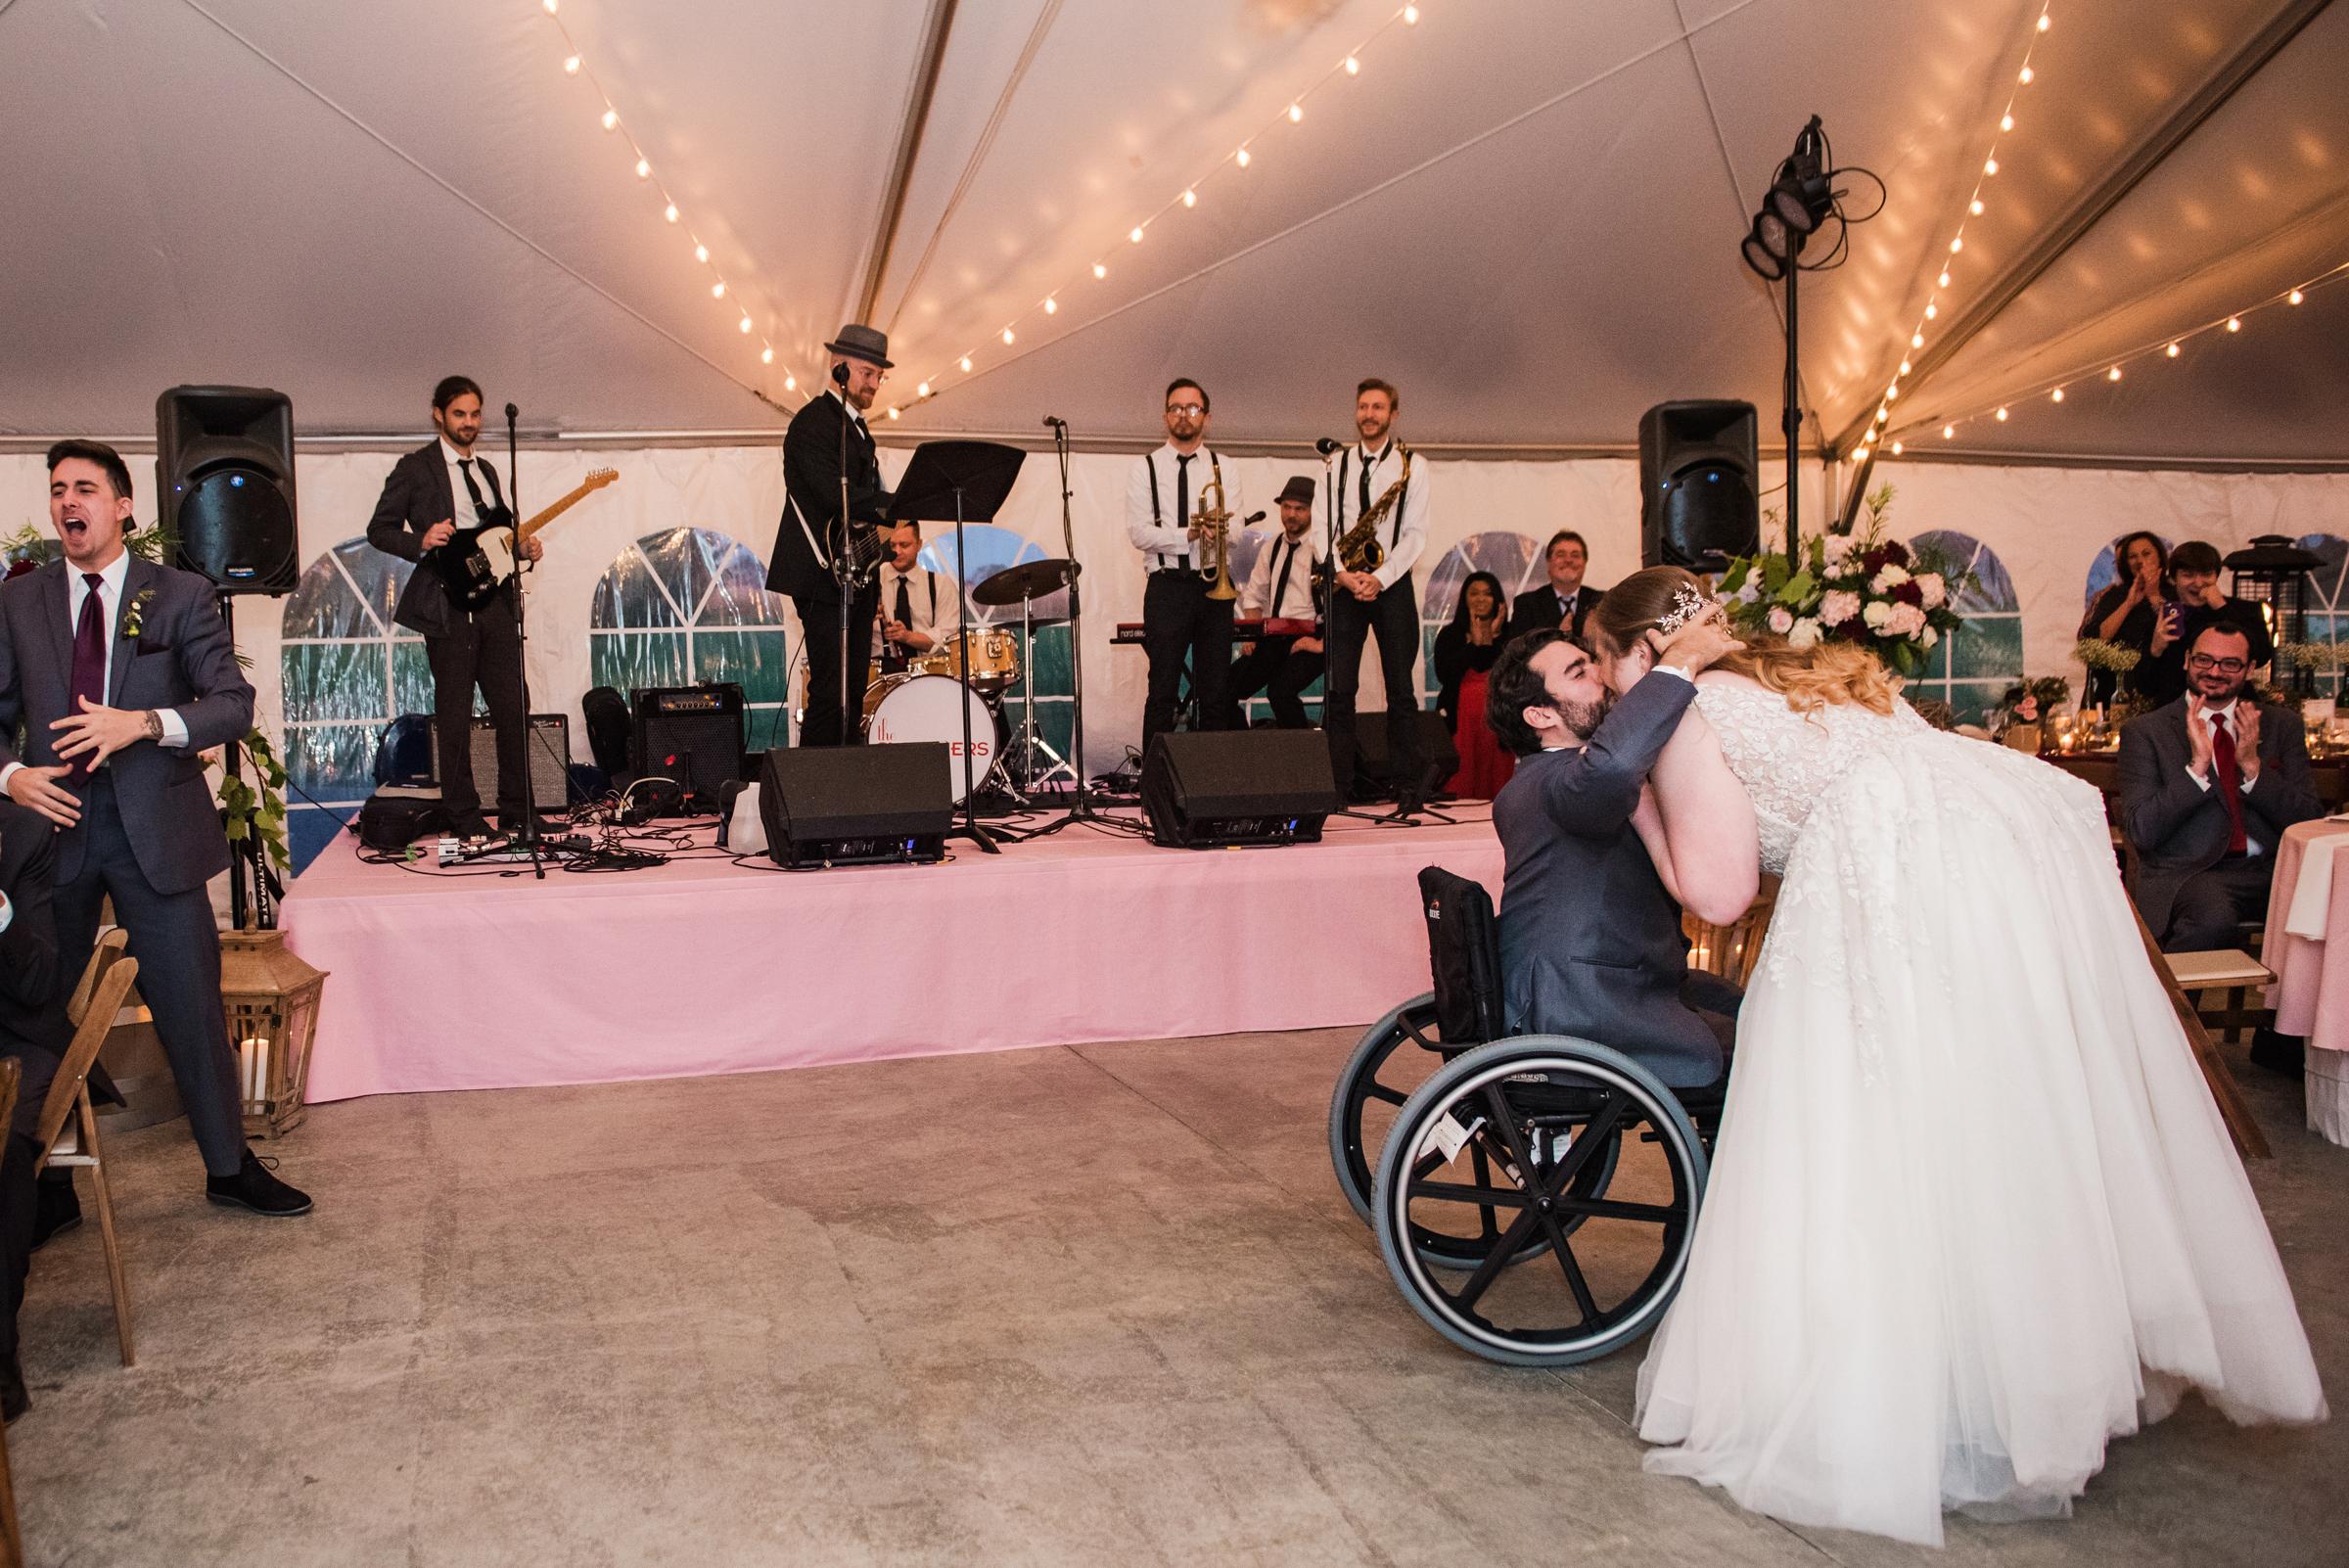 Zugibe_Vineyards_Finger_Lakes_Wedding_JILL_STUDIO_Rochester_NY_Photographer_DSC_4275.jpg